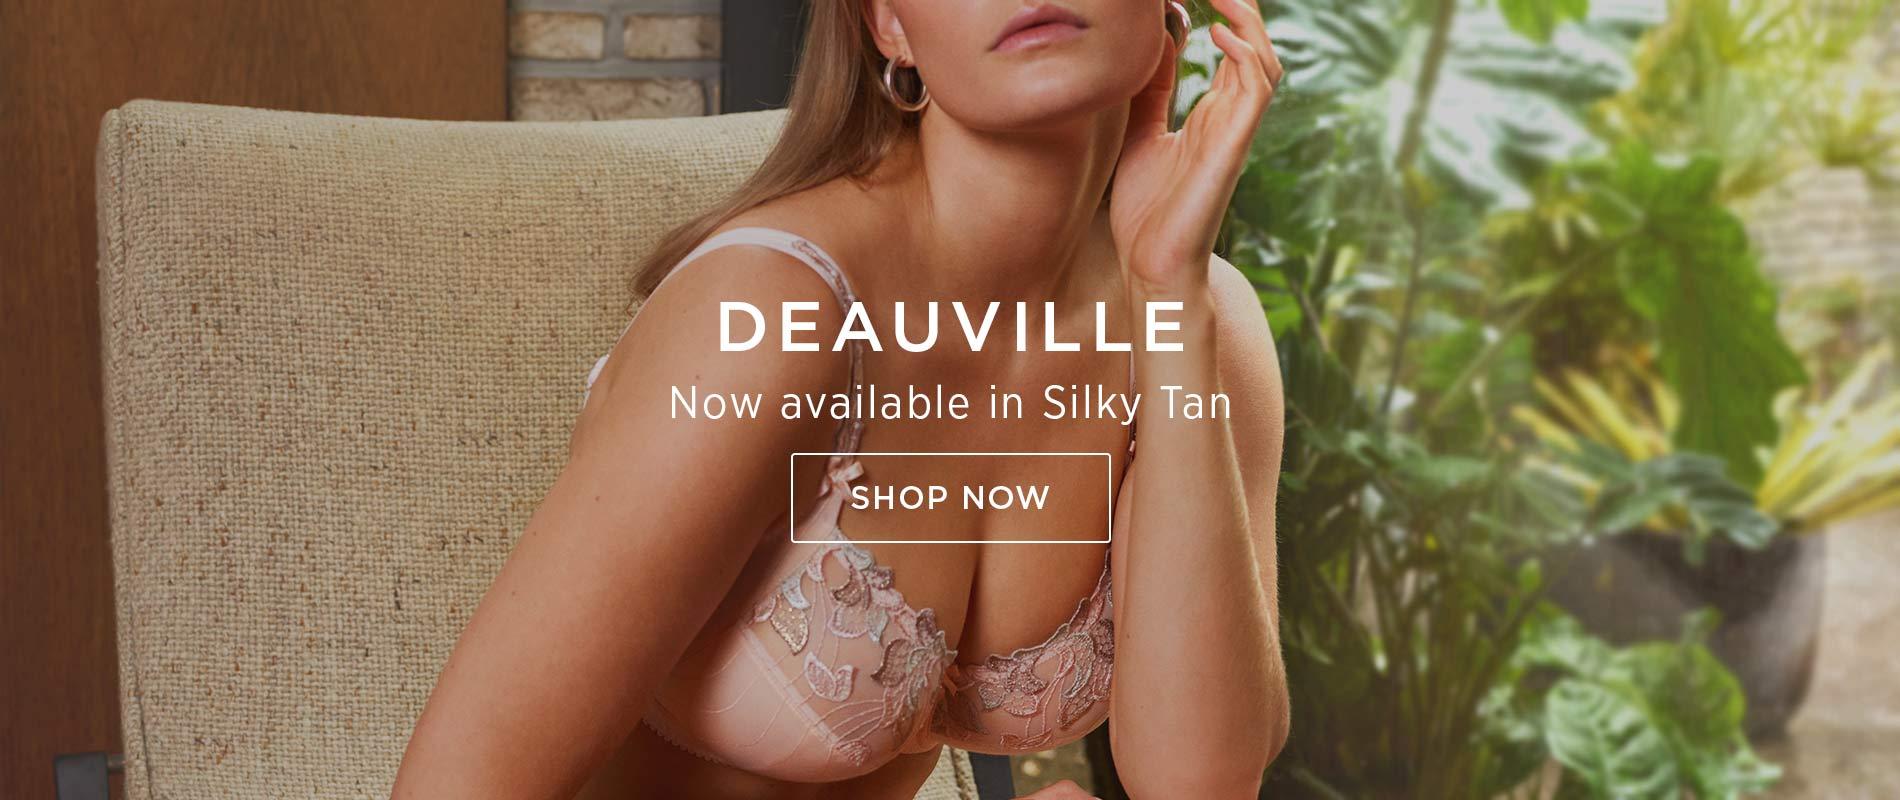 primadonna-deauville-silky-tan-dianes-lingerie-vancouver-1900x800